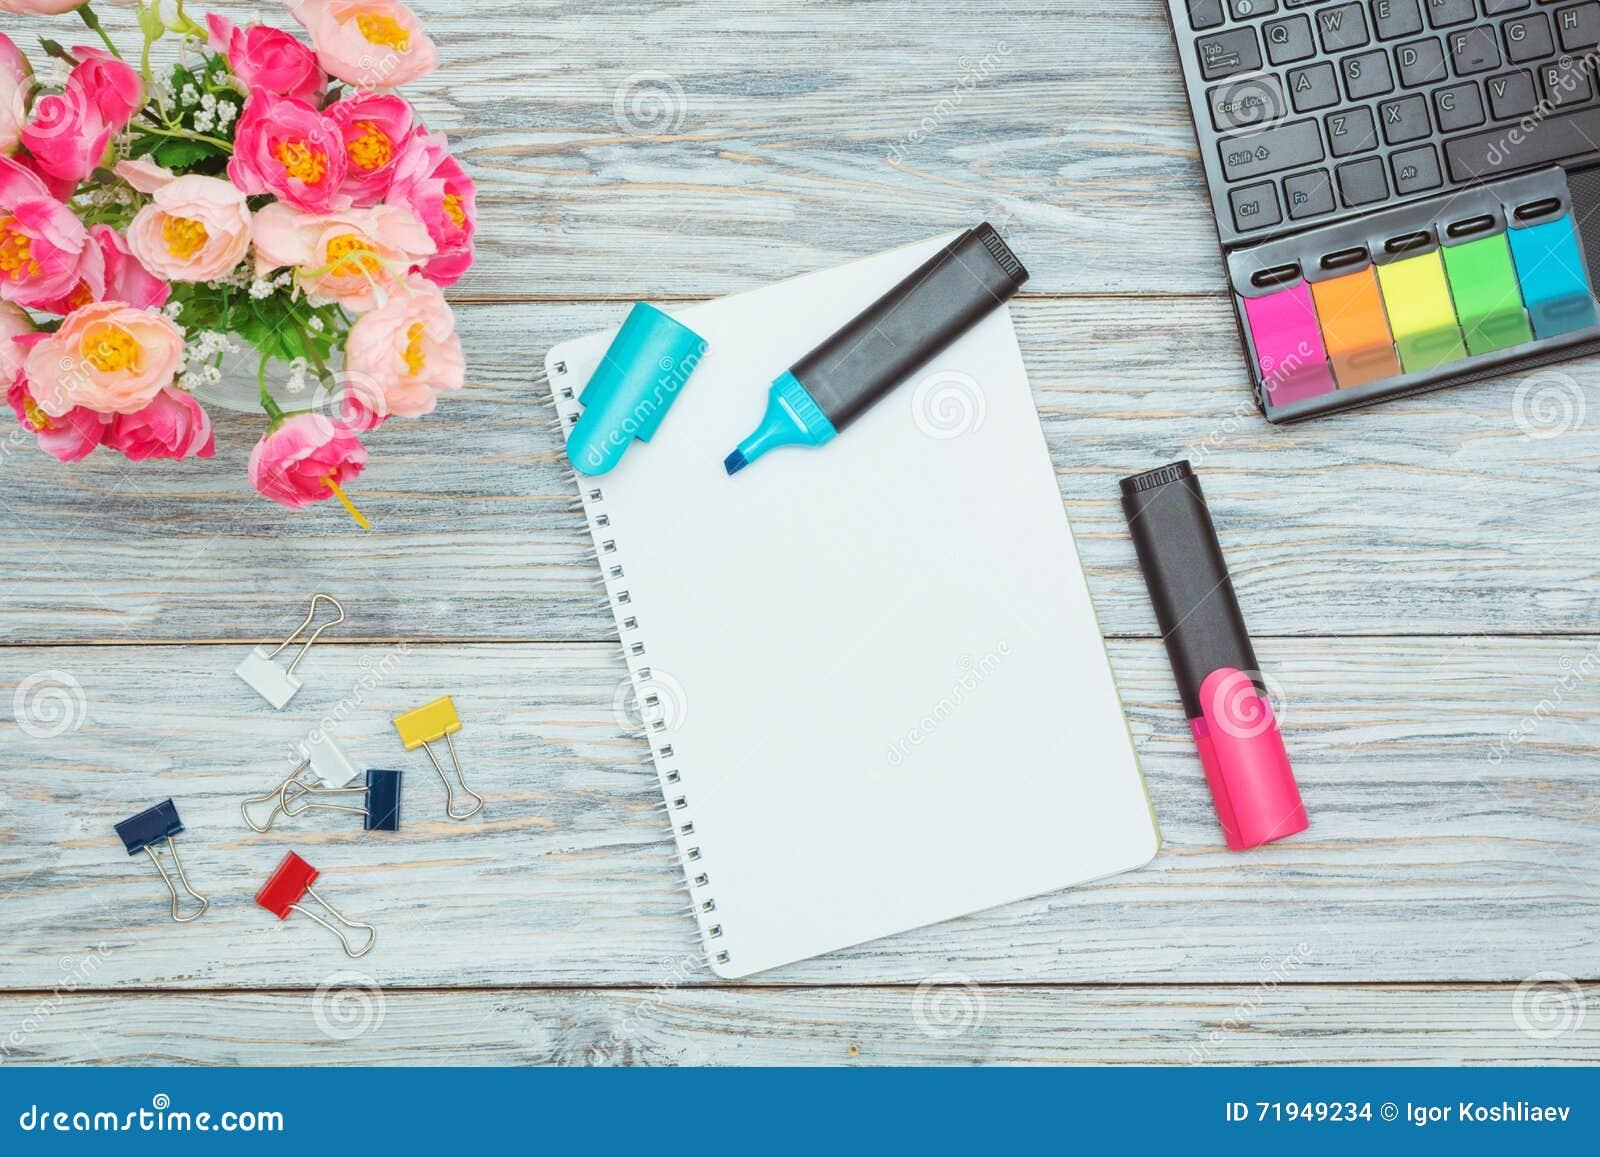 Канцелярские принадлежности, цветки и блокнот